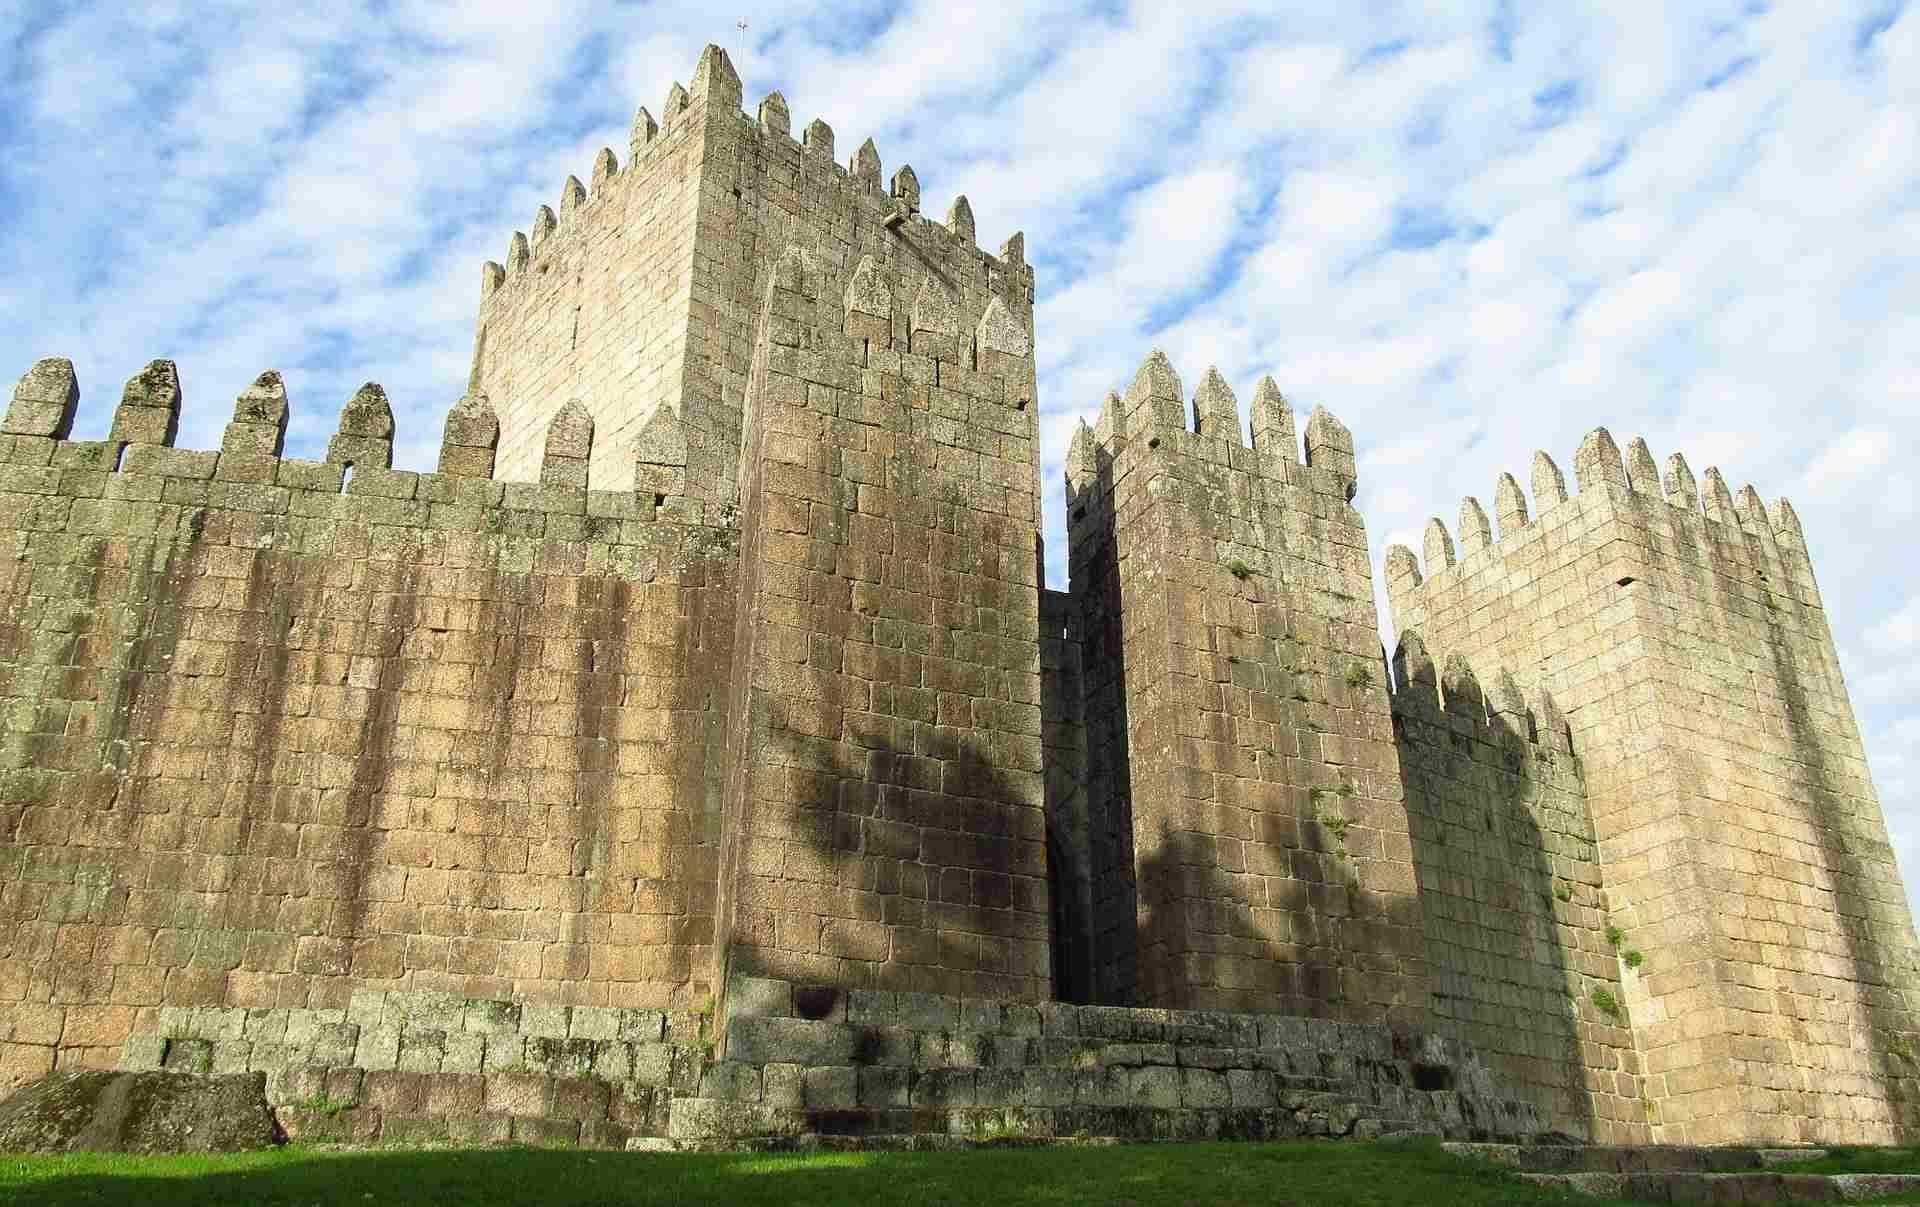 Medieval Guimaraes: Legends and Myths [QUEST IN TEST MODE] image